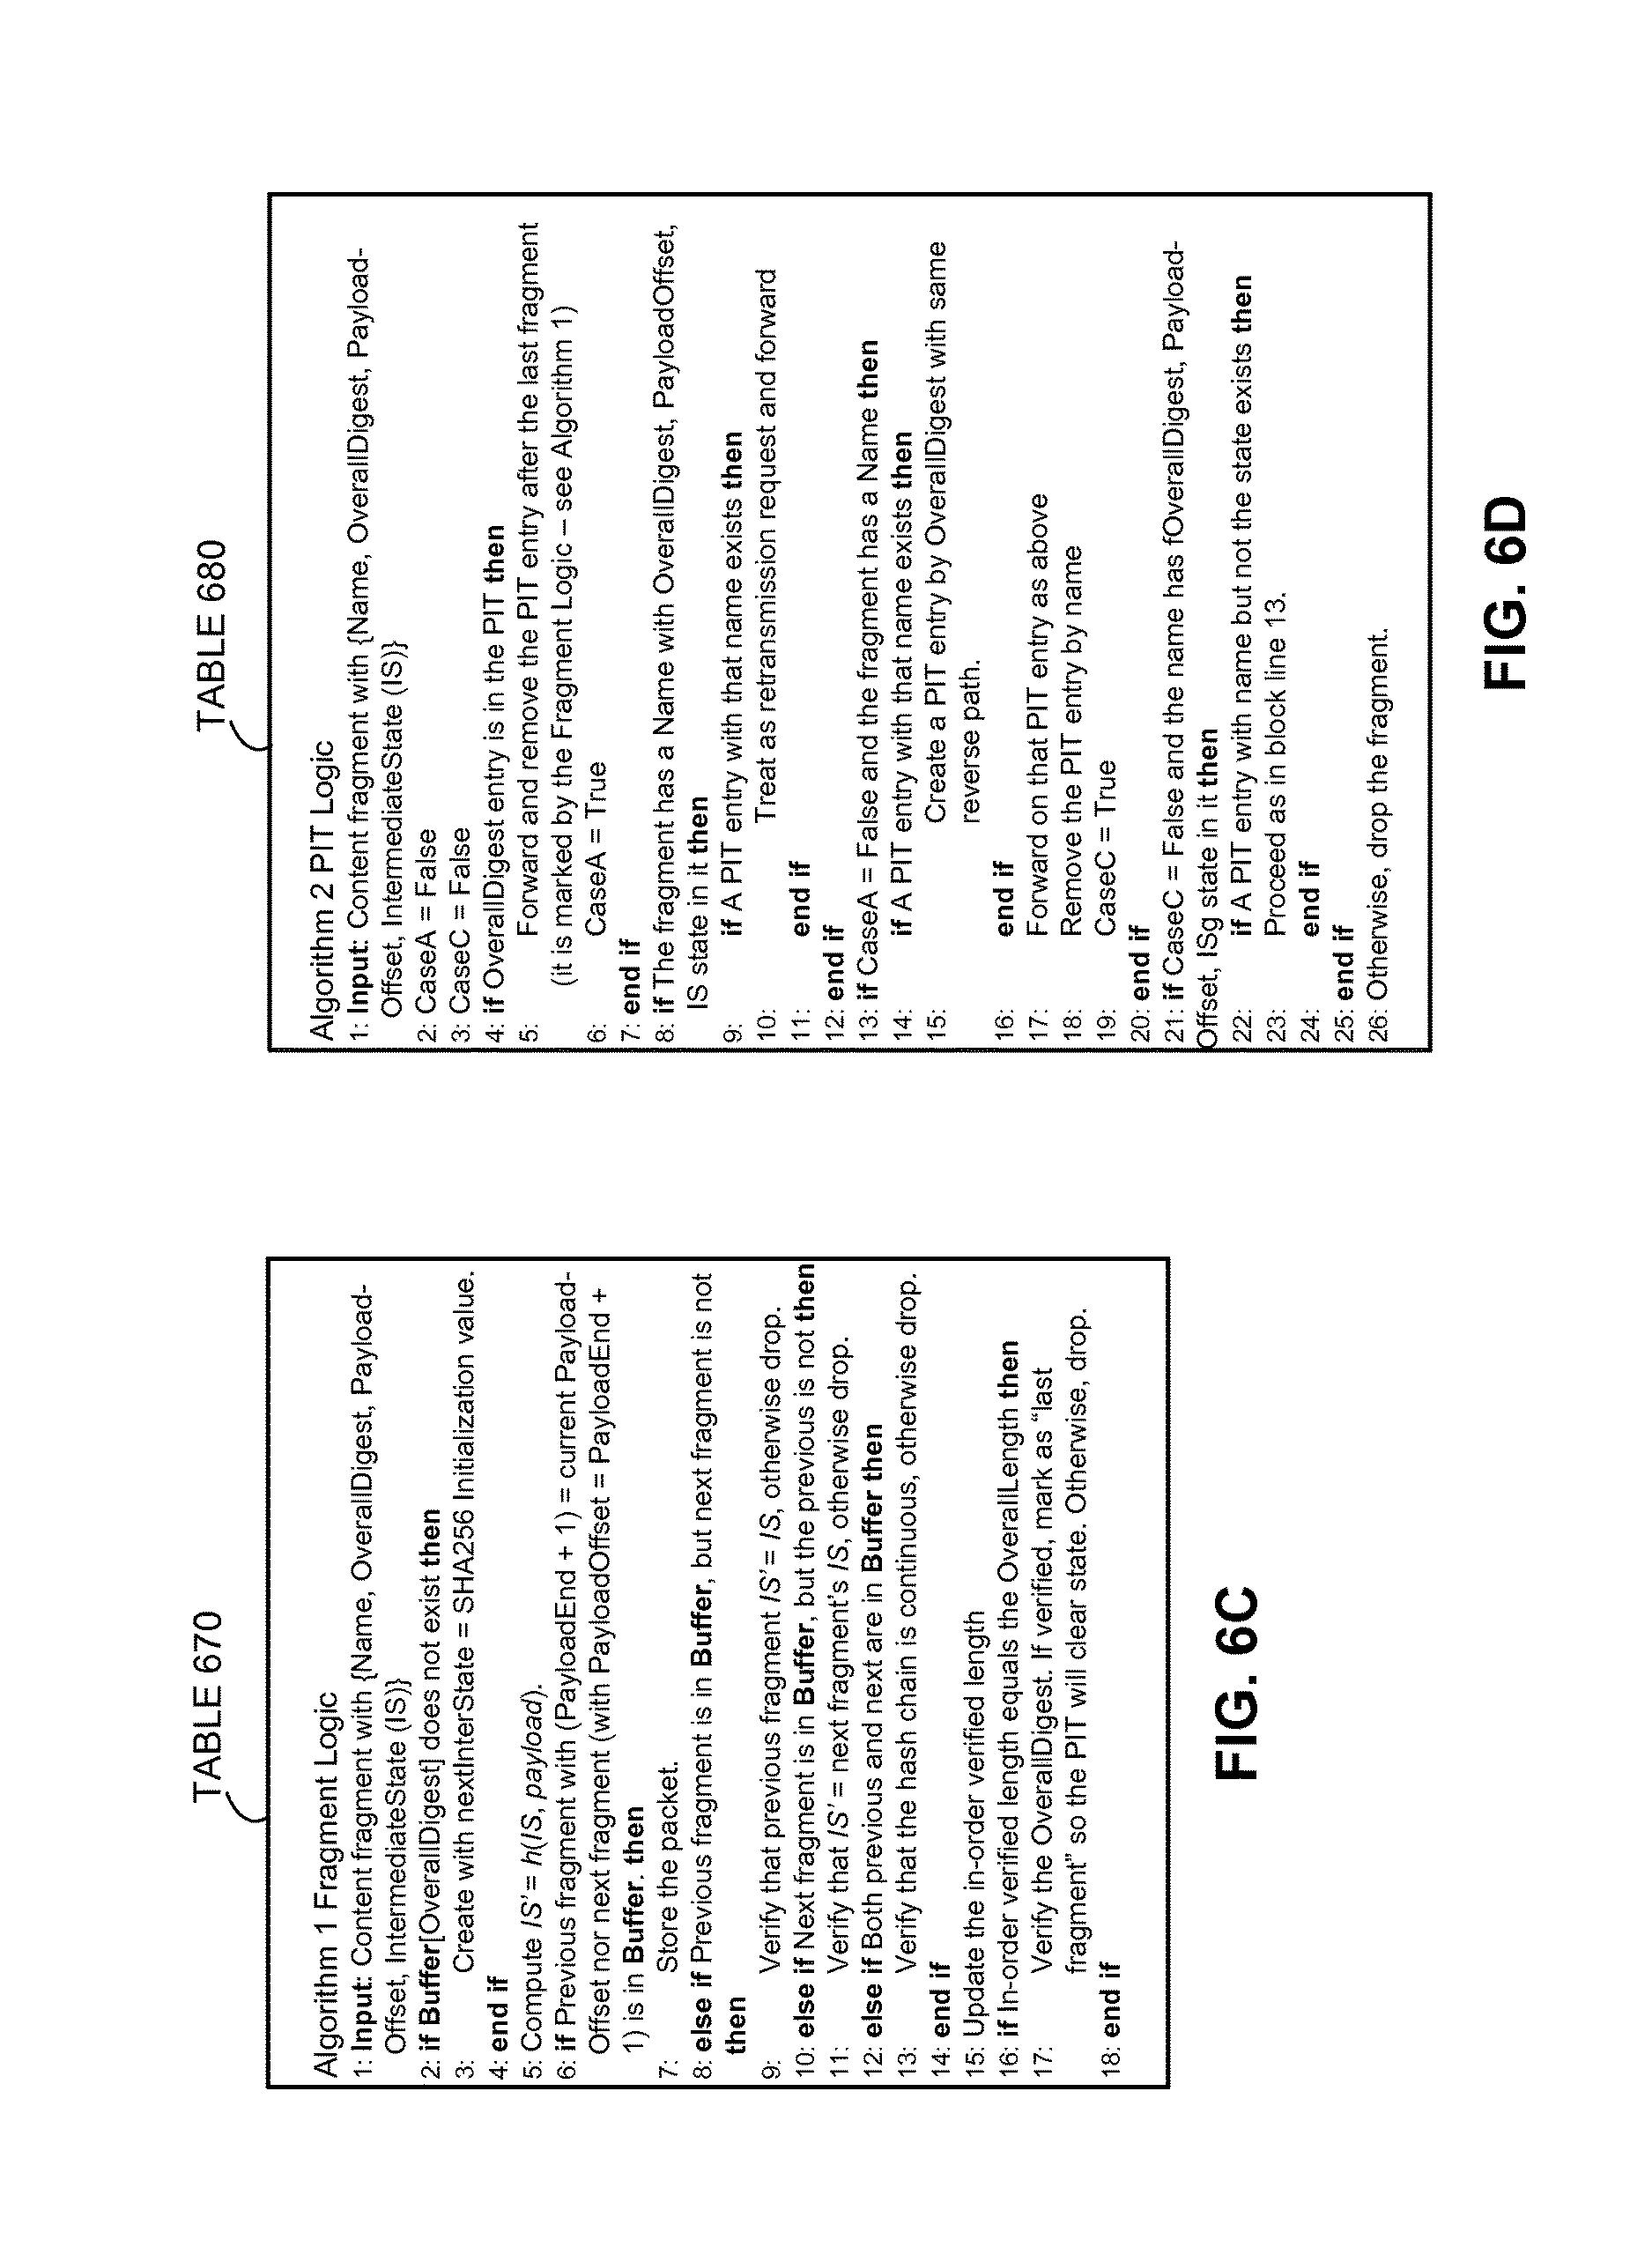 Patent US 9,832,123 B2